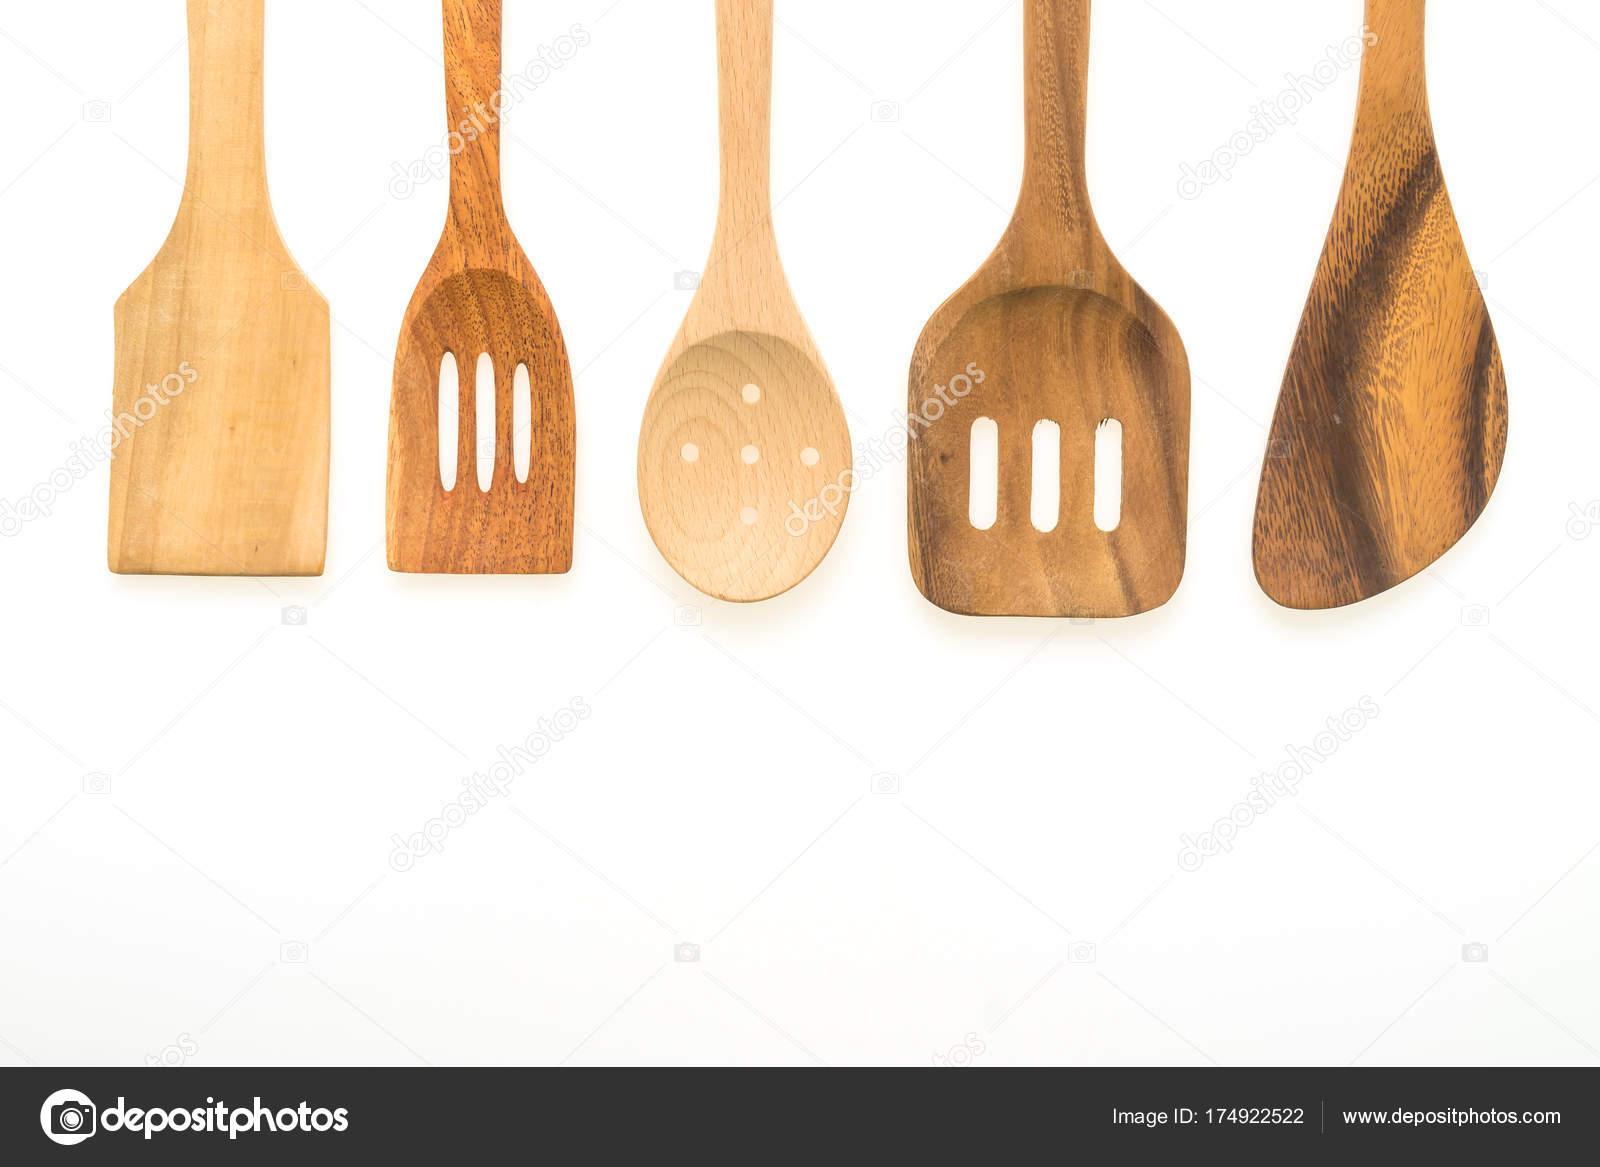 Wood Utensils Kitchen Ware Isolated White Background — Stock Photo ...